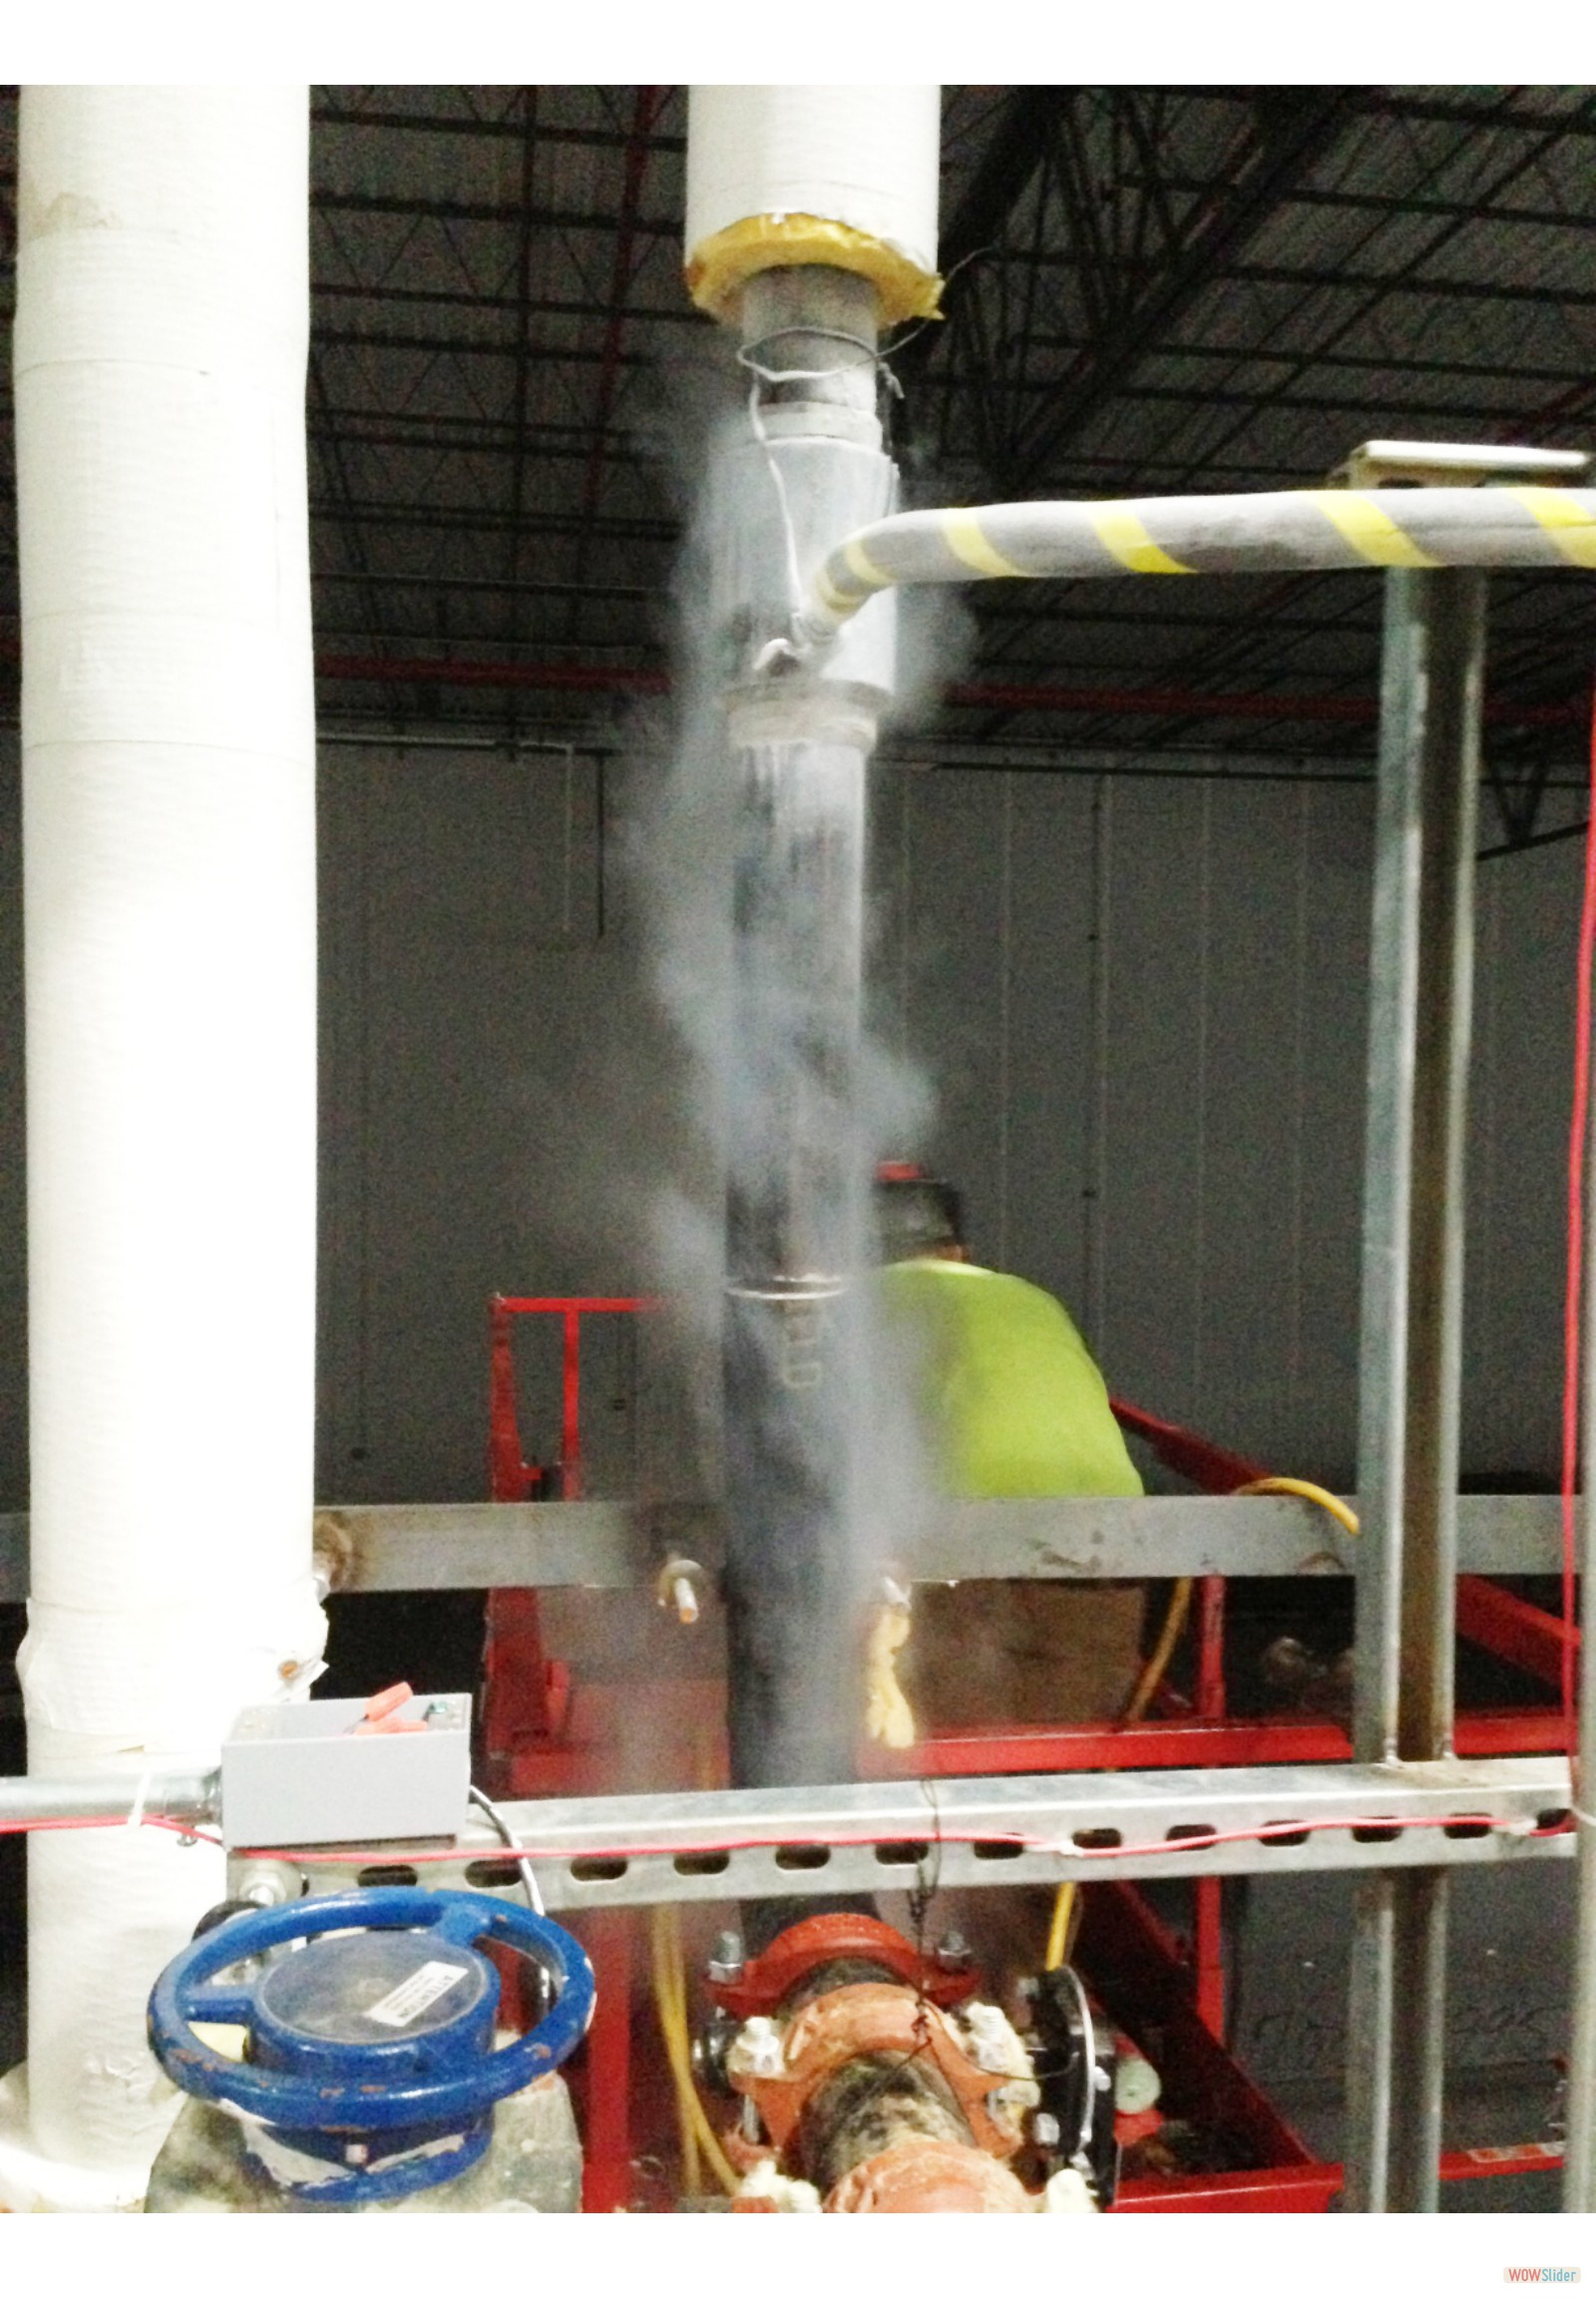 3 Inch FreezePlug Pipeline Cut by Welder